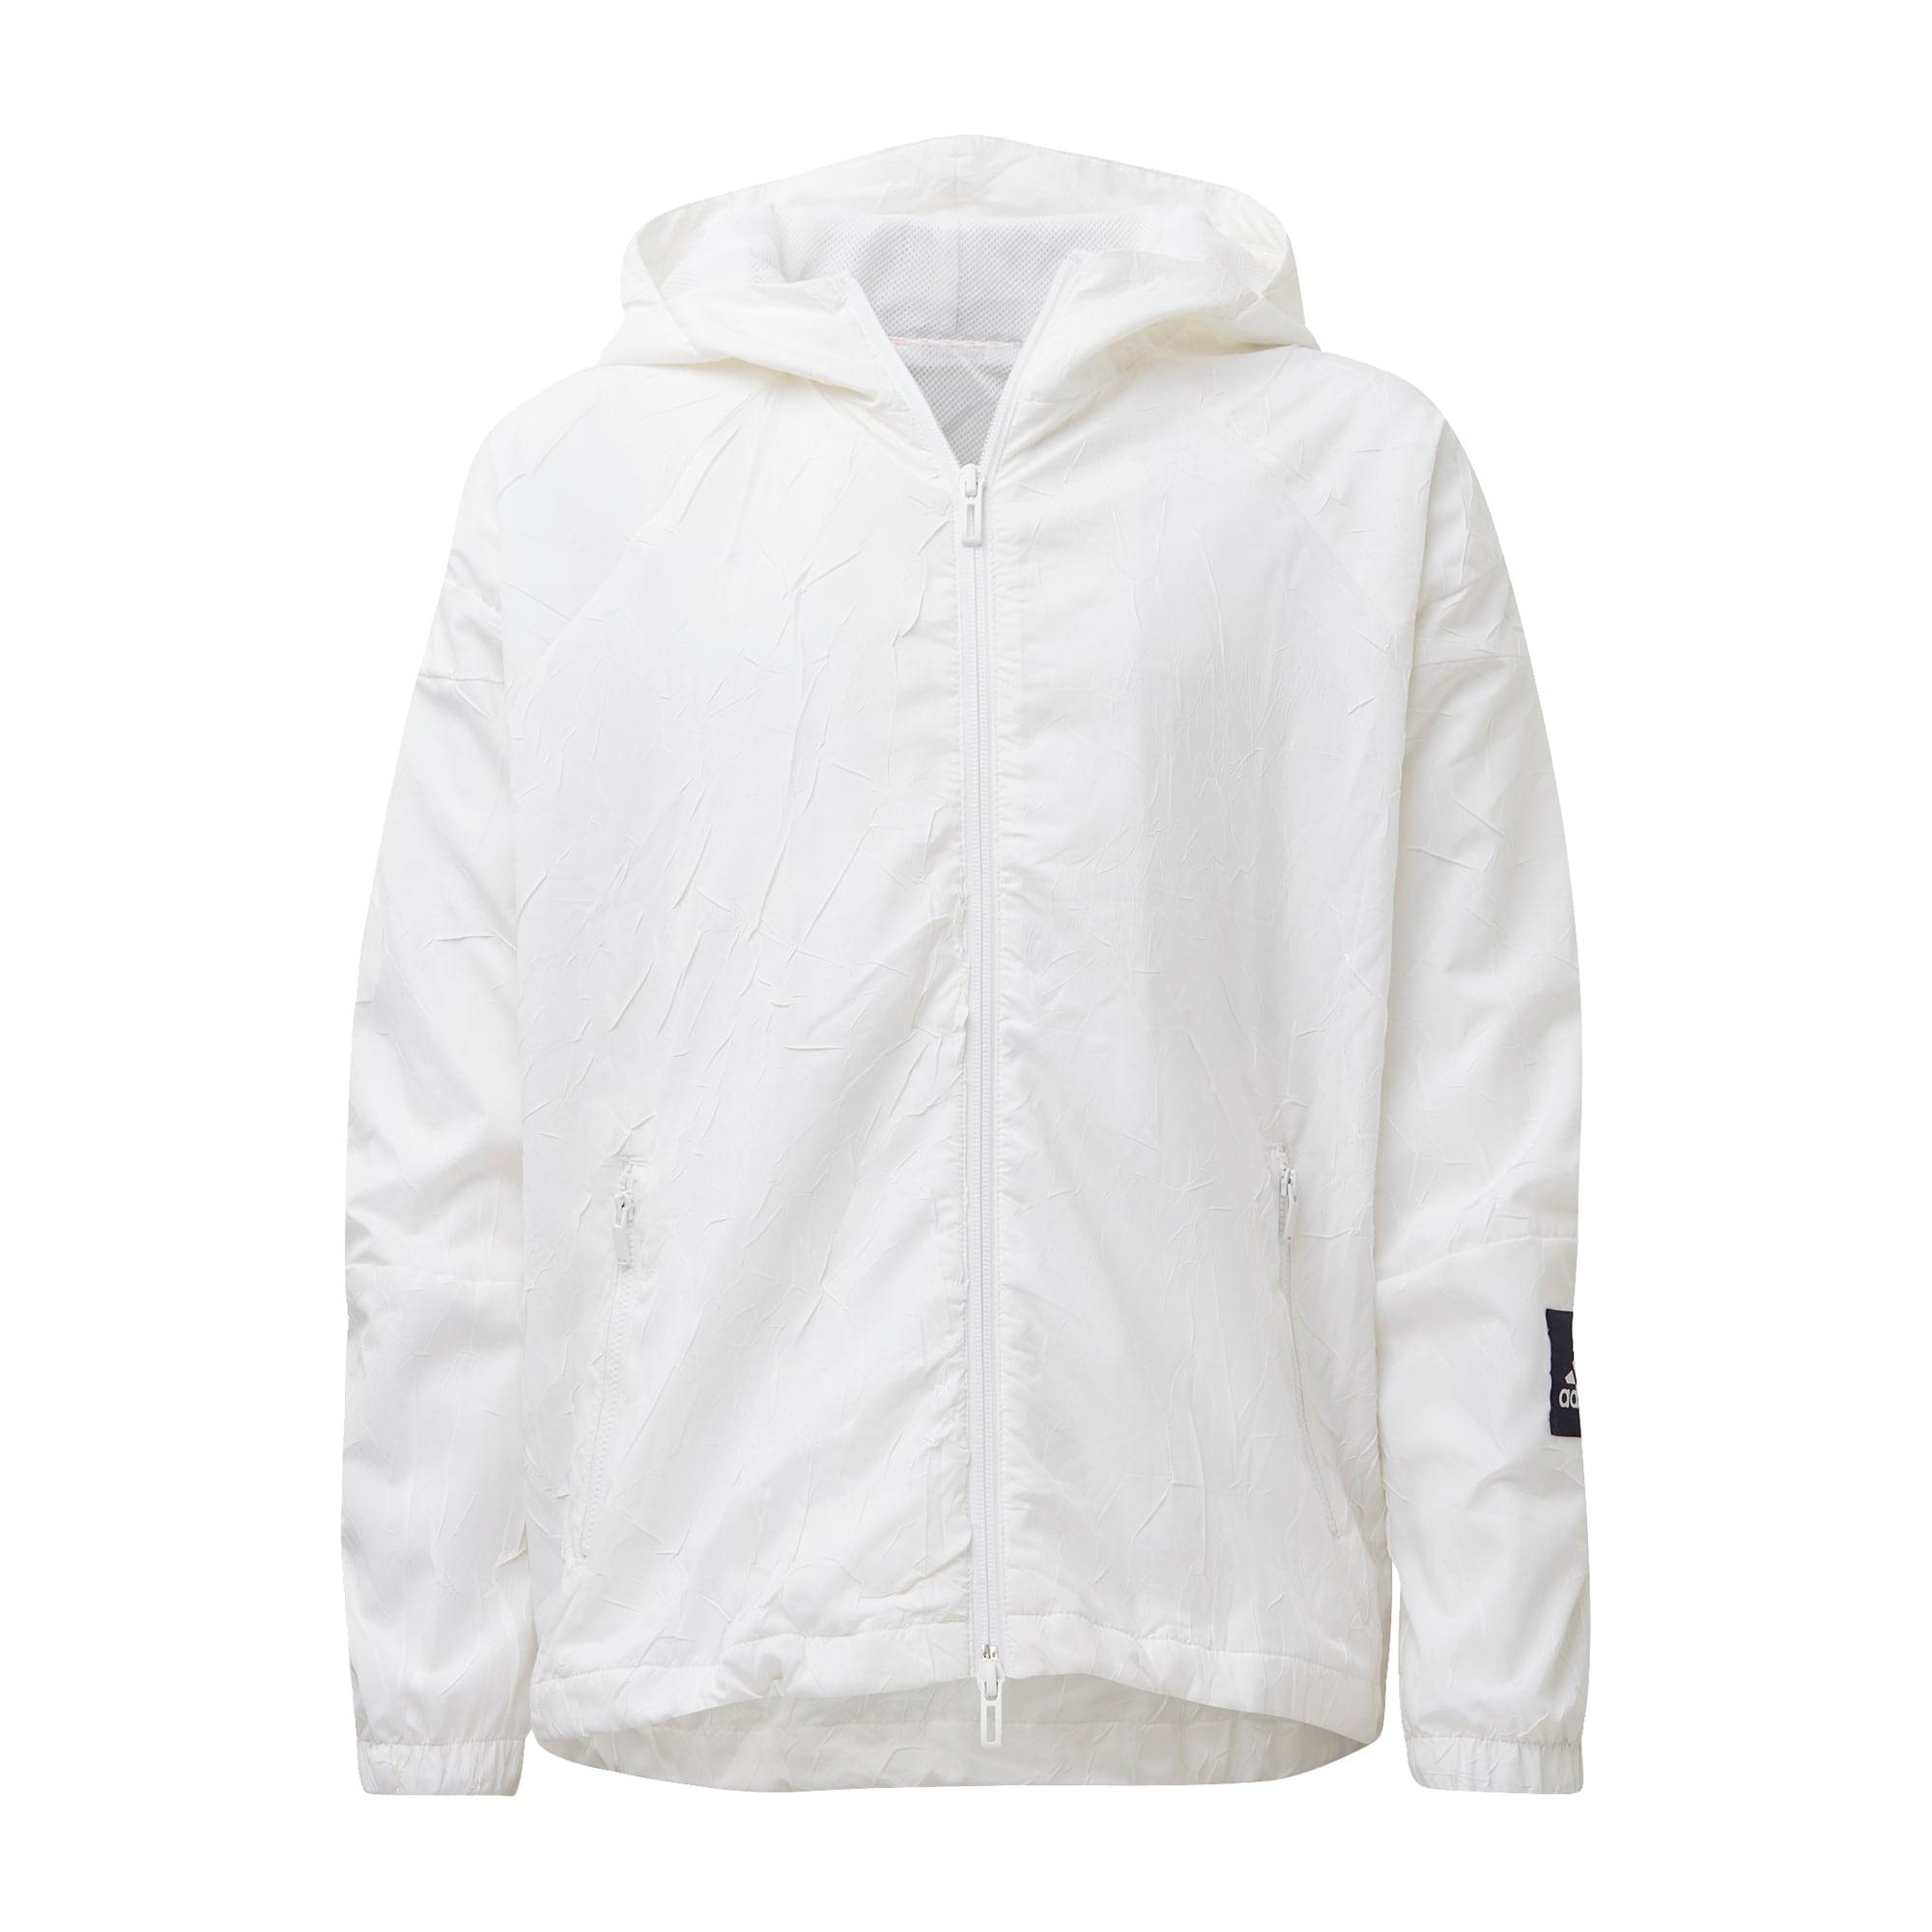 ADIDAS PERFORMANCE Športová bunda 'W.N.D. Primeblue'  biela / čierna